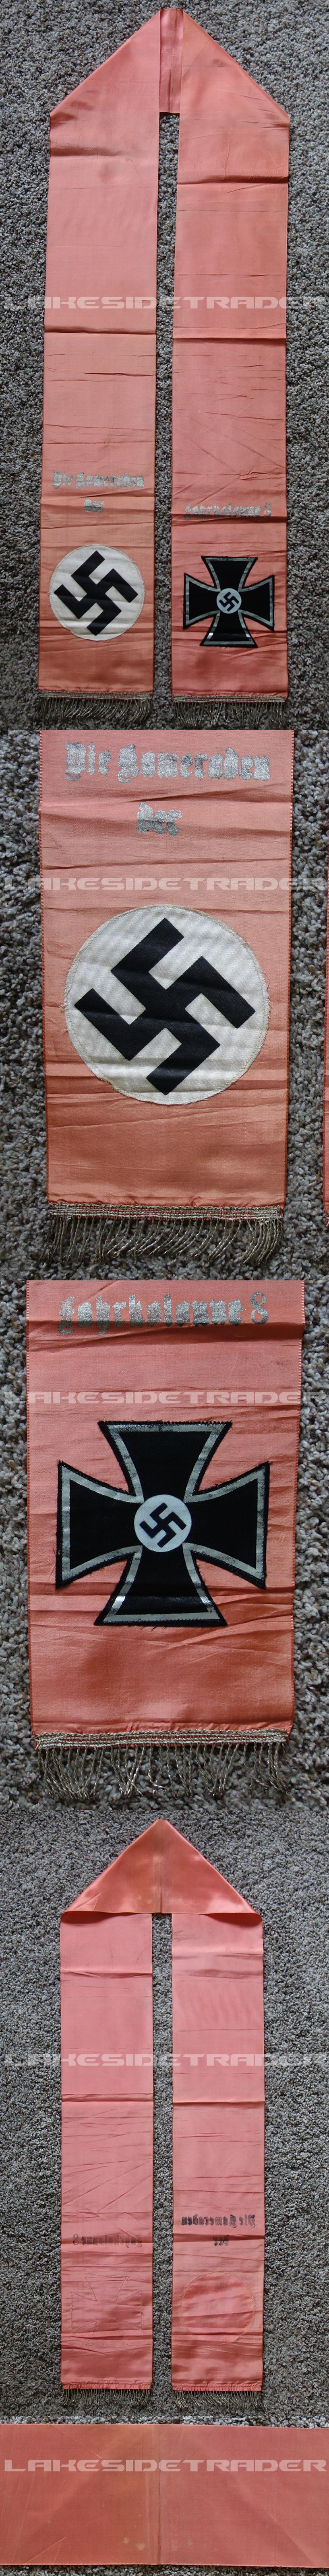 NSDAP Funeral Sash